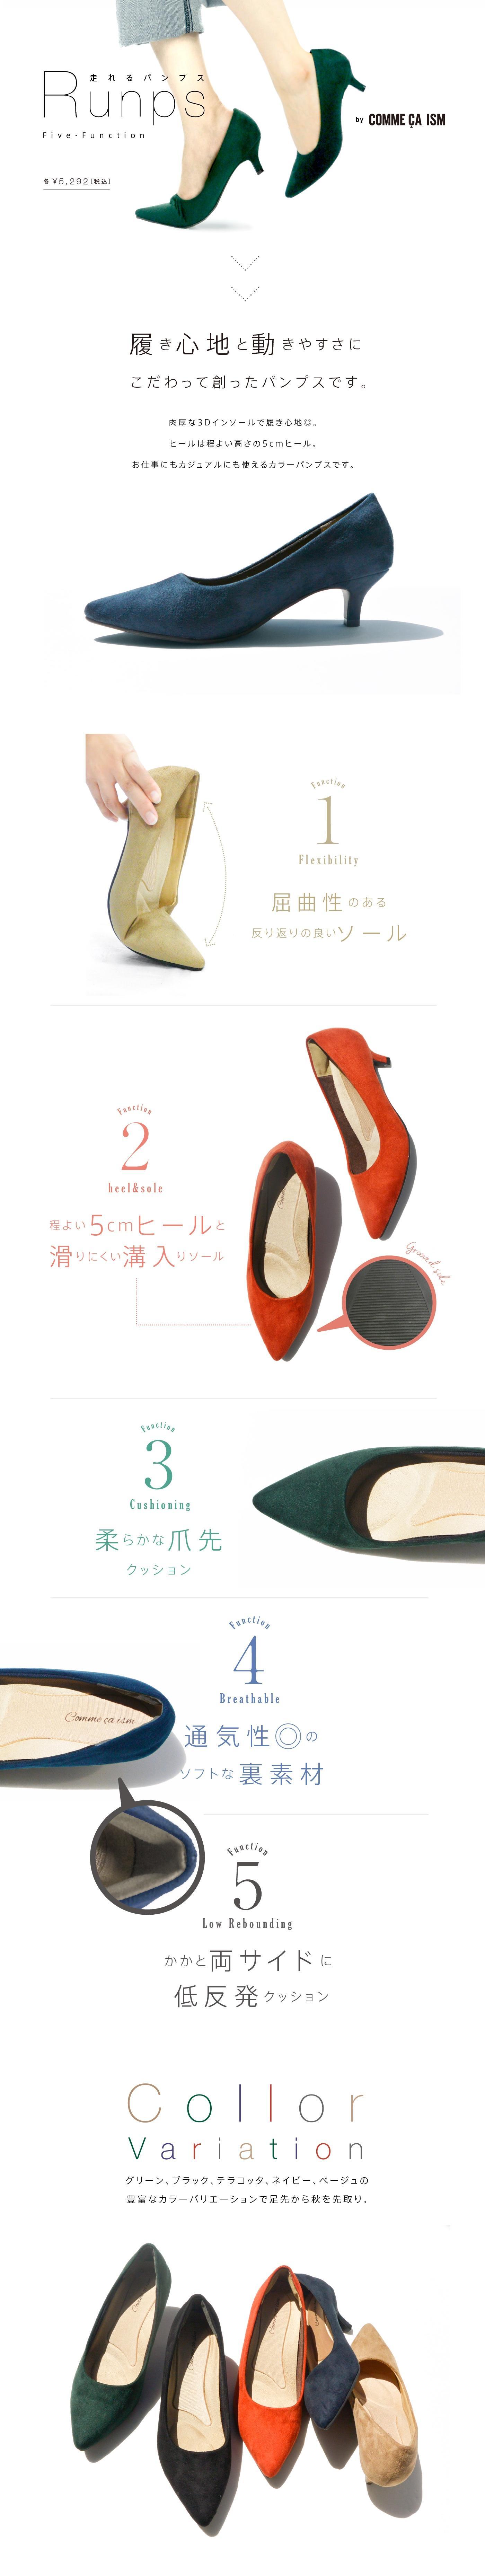 KT_webデザインonline_01.jpg